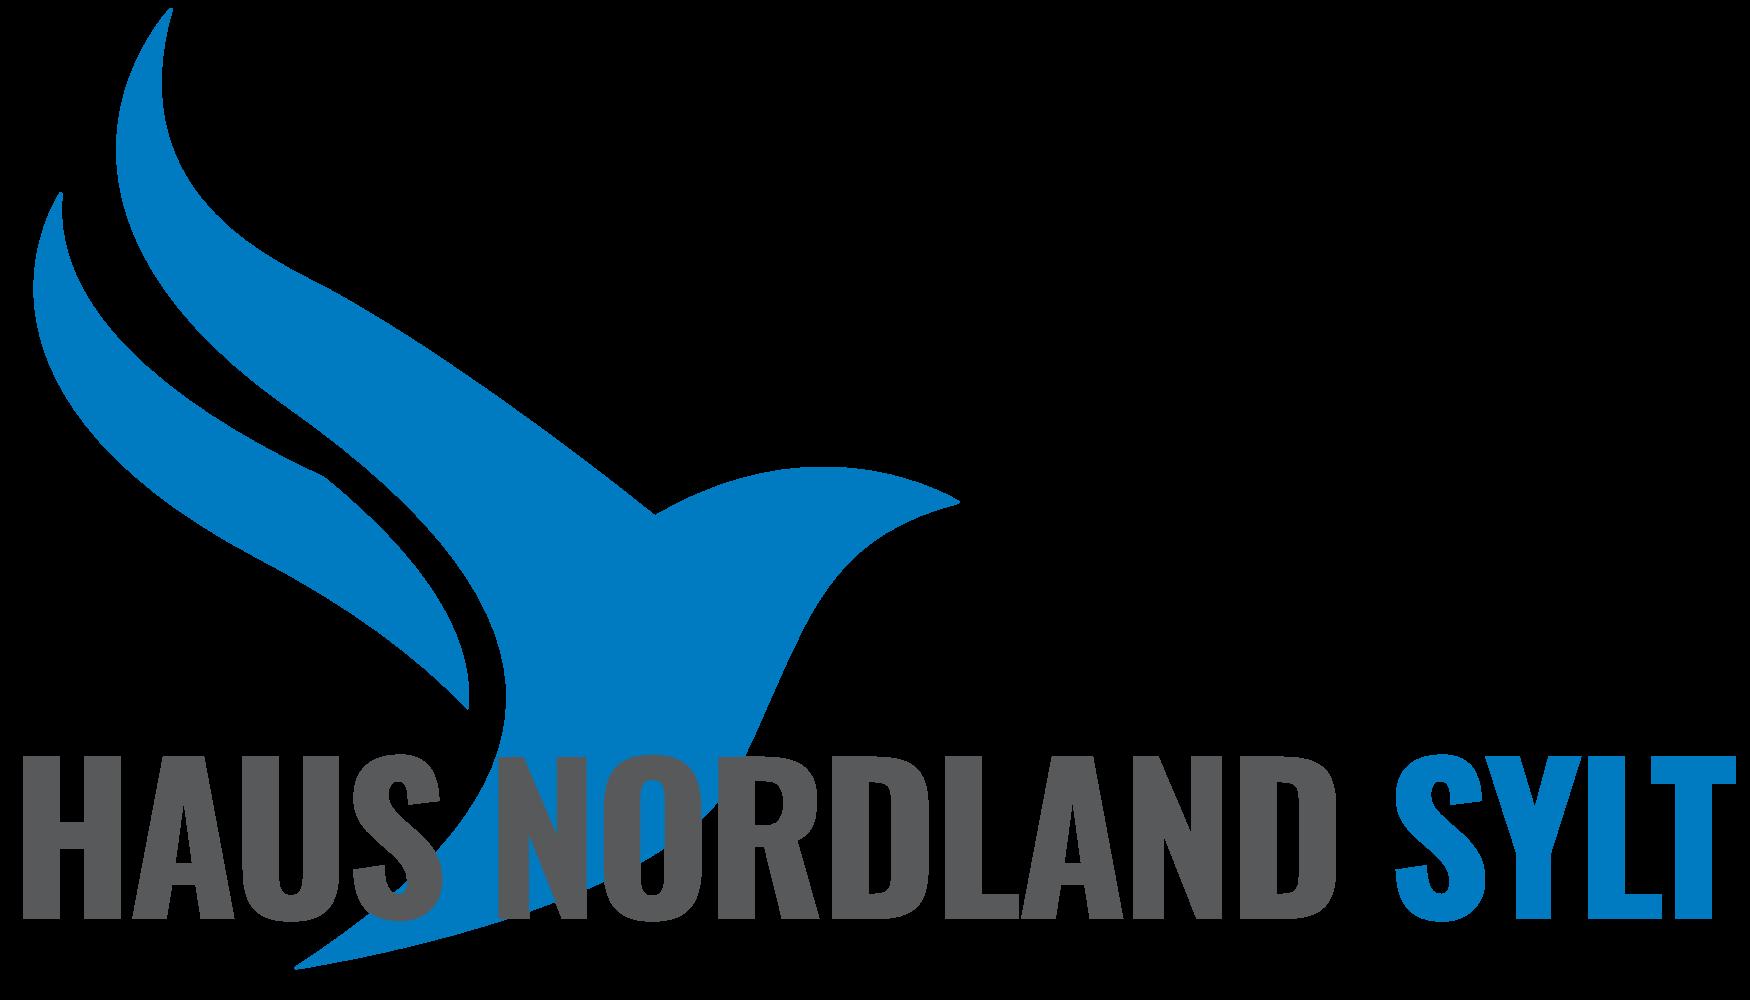 Haus Nordland - Sylt